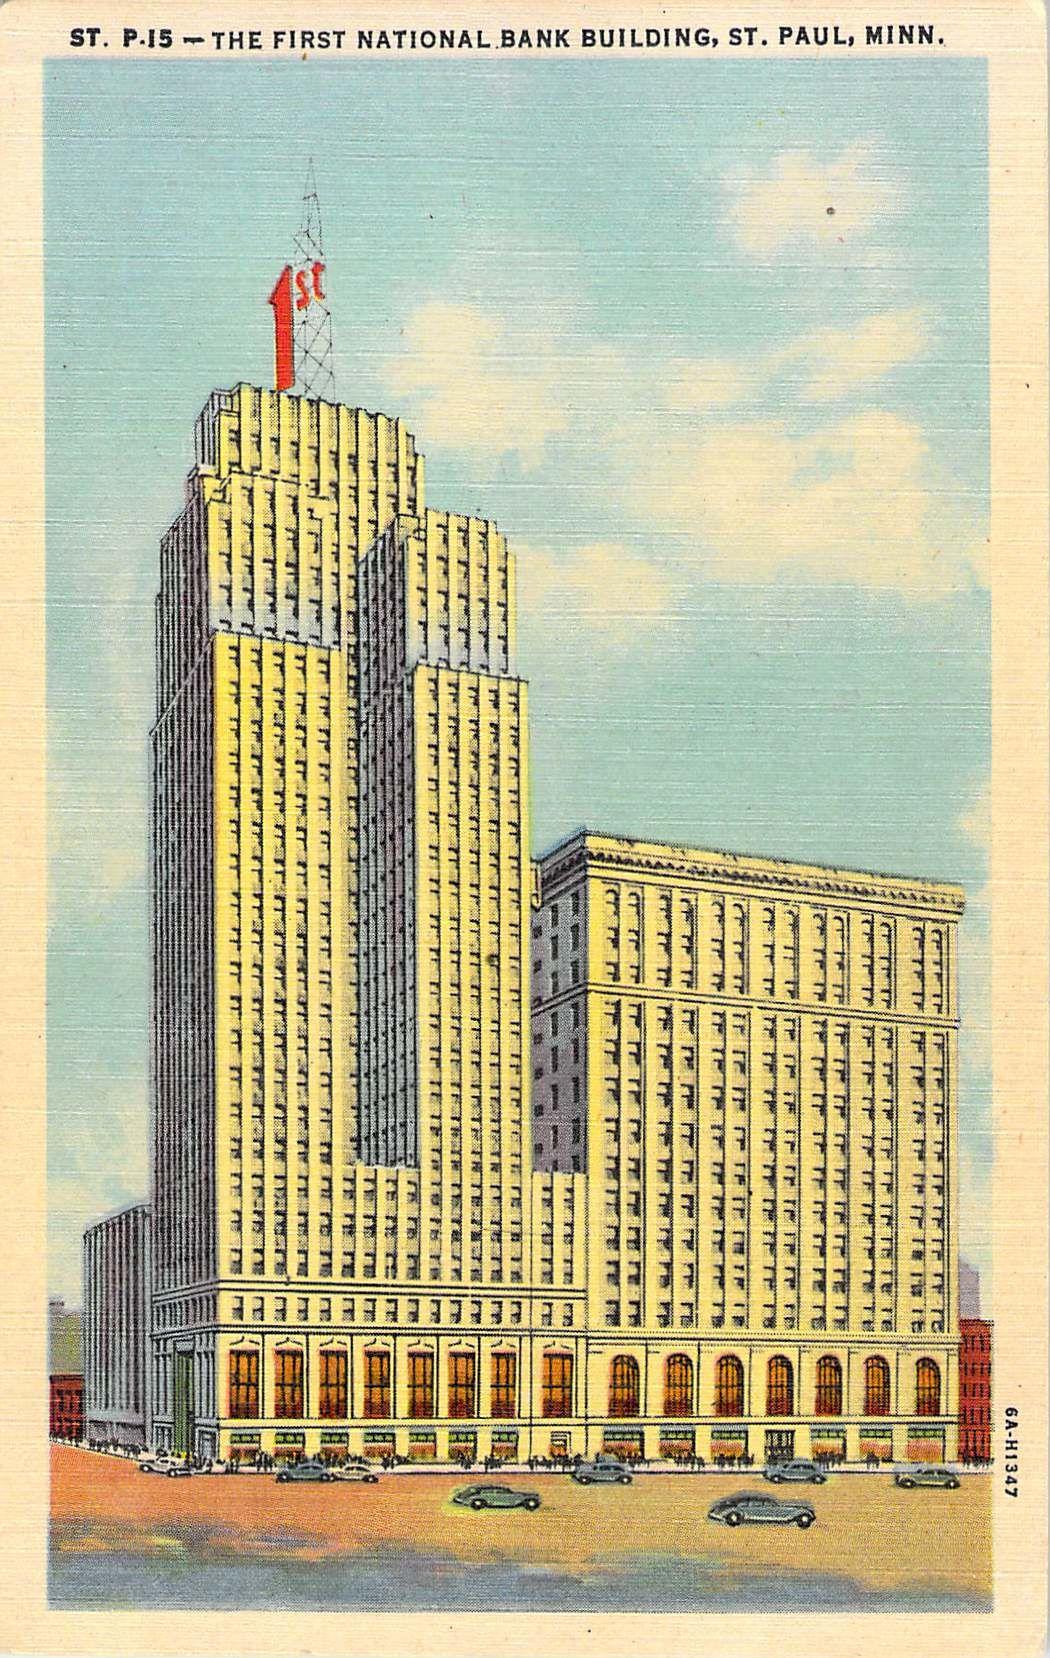 First National Bank Building St Paul Mn St Paul Minnesota Banks Building Art Deco Architecture